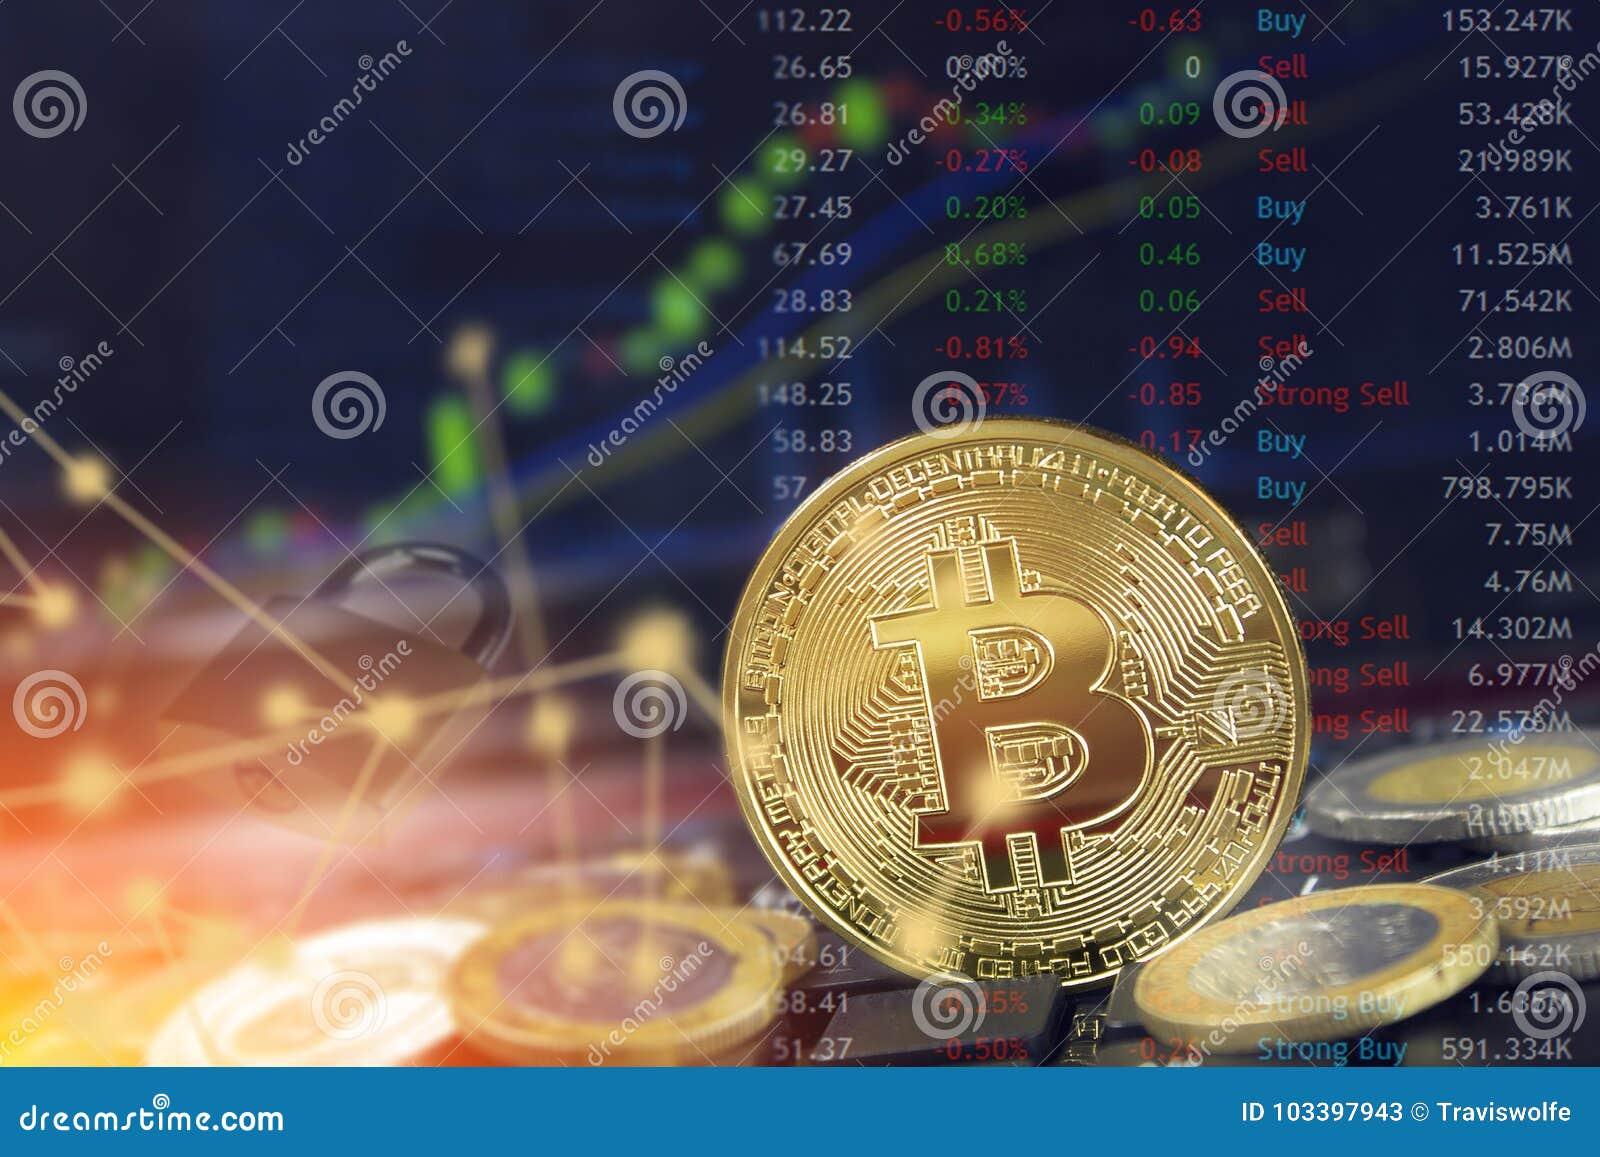 tradingview kraken btc usd bitcoin rinkodaros strategija